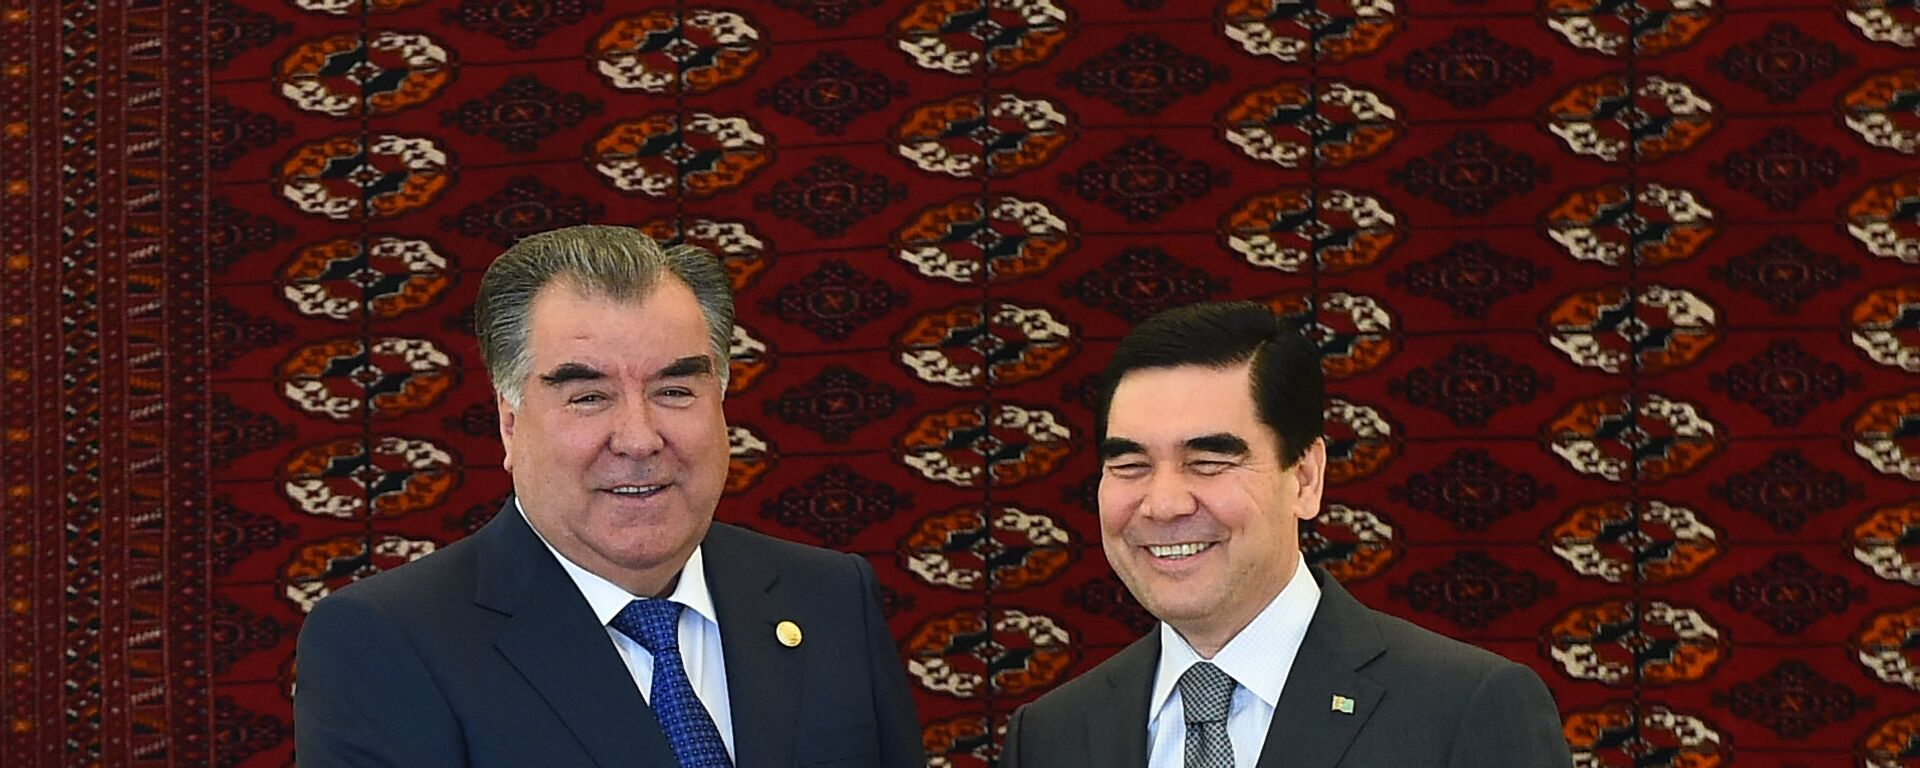 Президент РТ Эмомали Рахмон вместе с президентом Туркменистана Гурбангулы Бердымухамедовым - Sputnik Тоҷикистон, 1920, 27.07.2021